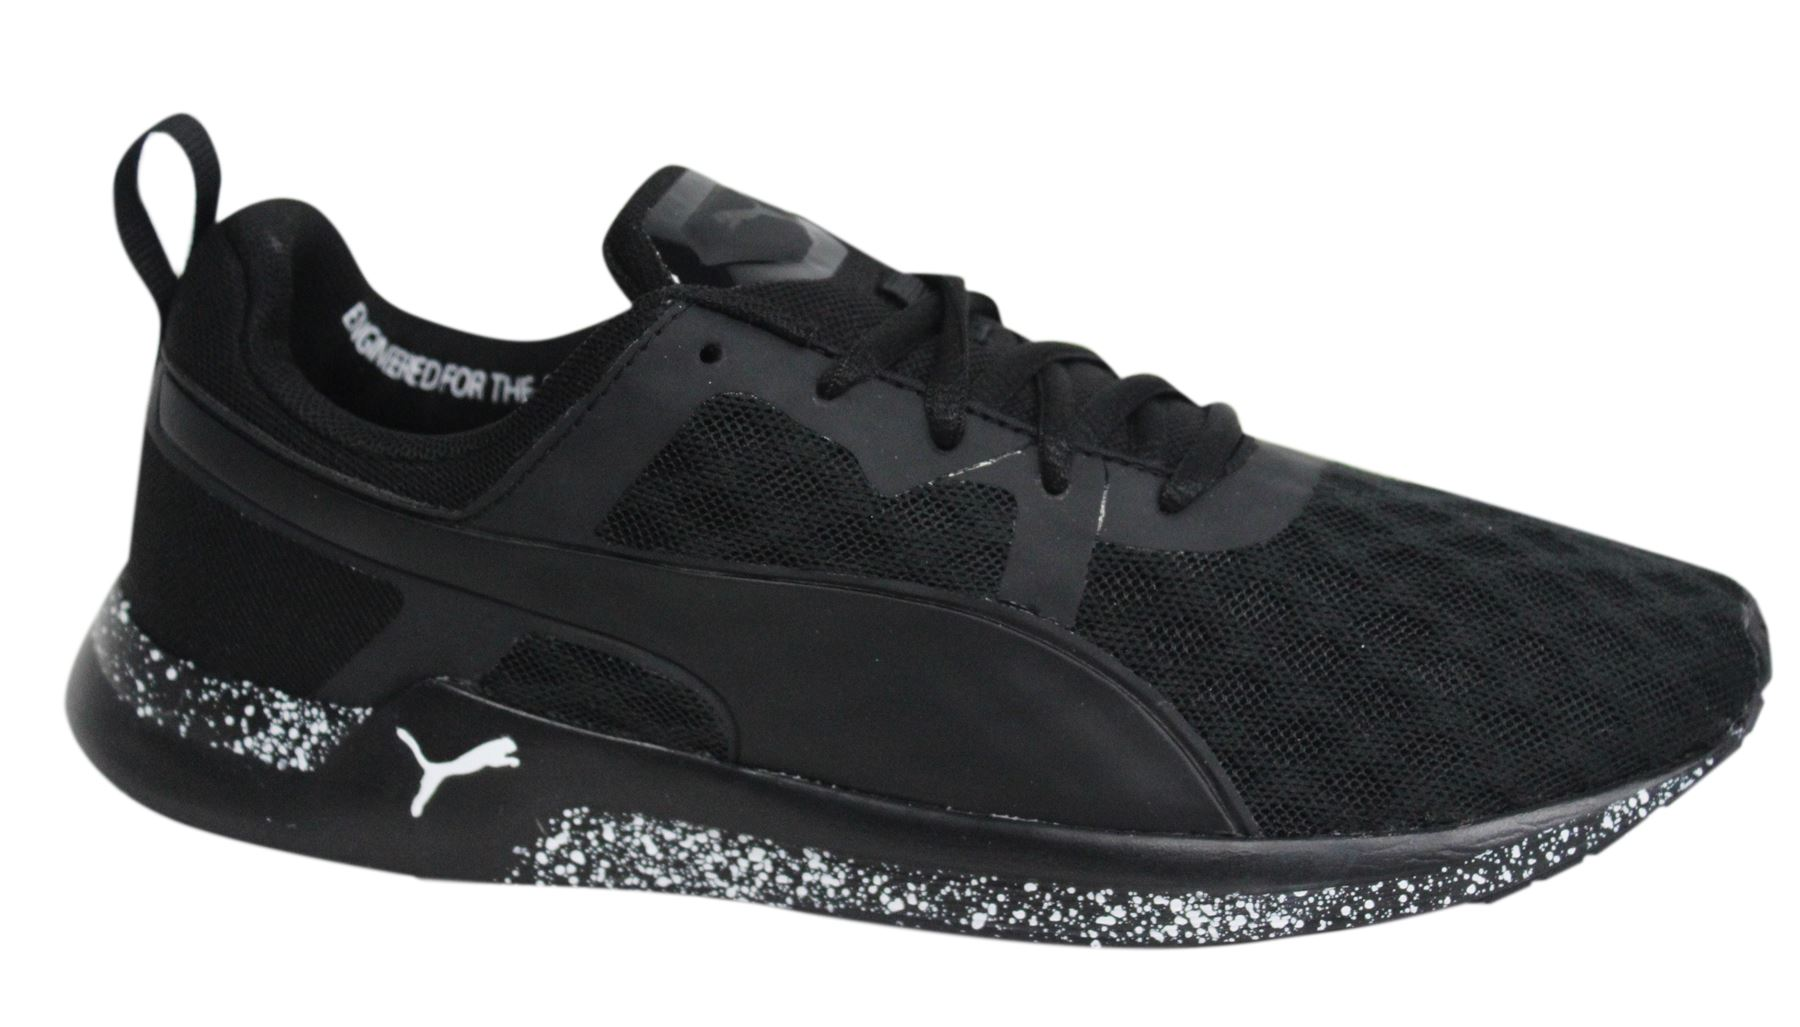 Puma XT Pulse XT Puma v2 FT Lace Up schwarz Weiß Textile Damenschuhe Trainers e69e3b